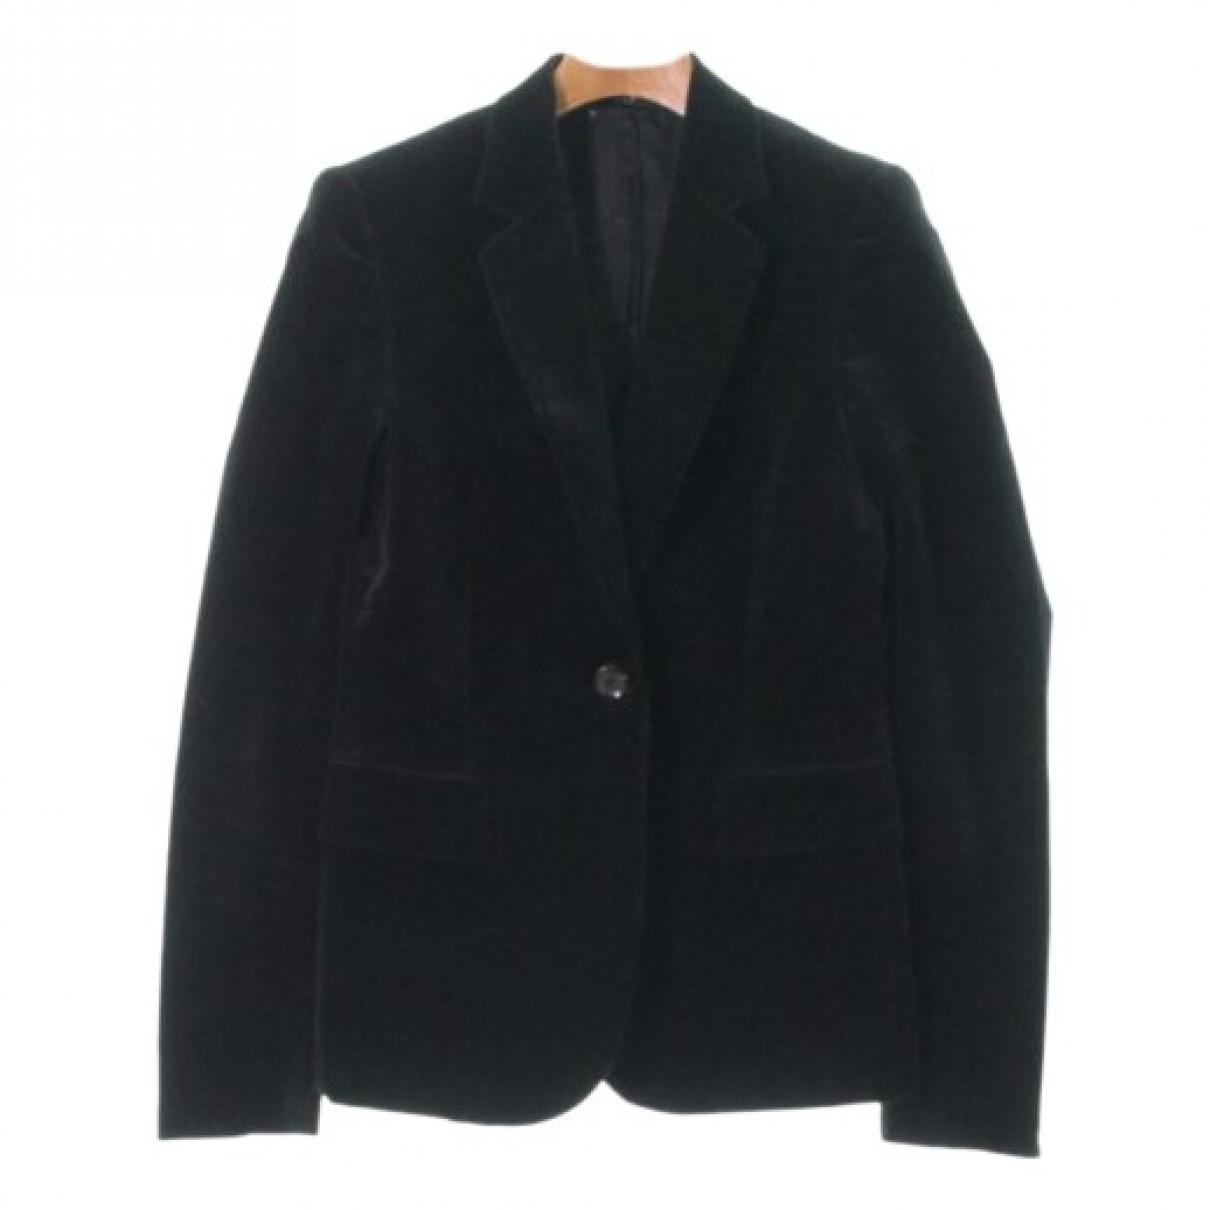 Gucci \N Black Cotton jacket for Women 38 IT